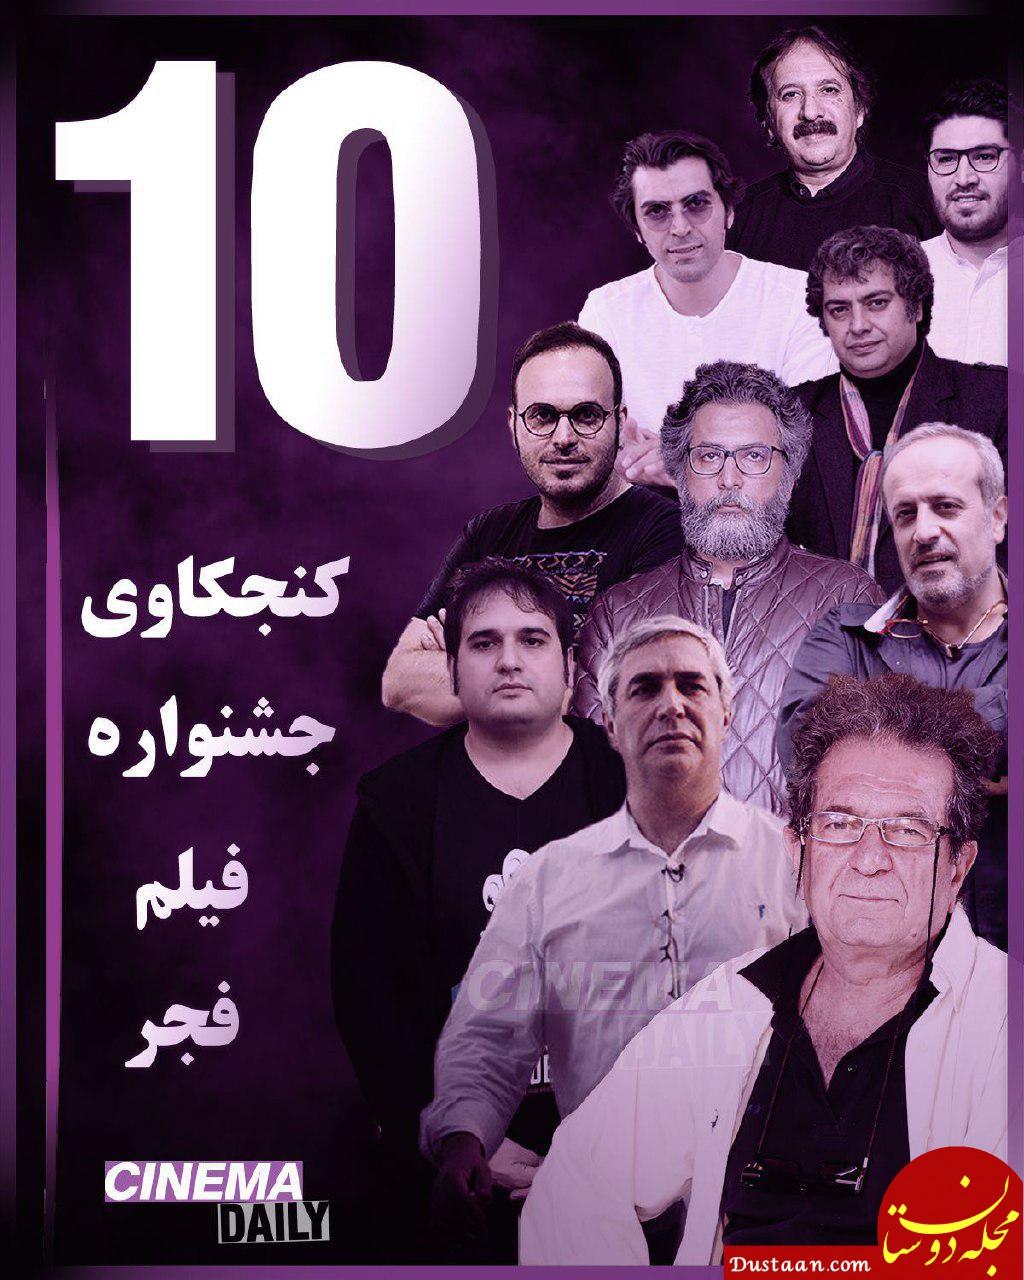 www.dustaan.com ده فیلم کنجکاوی برانگیز جشنواره فجر/ از «لامینور» مهرجویی تا «درخت گردو» مهدویان